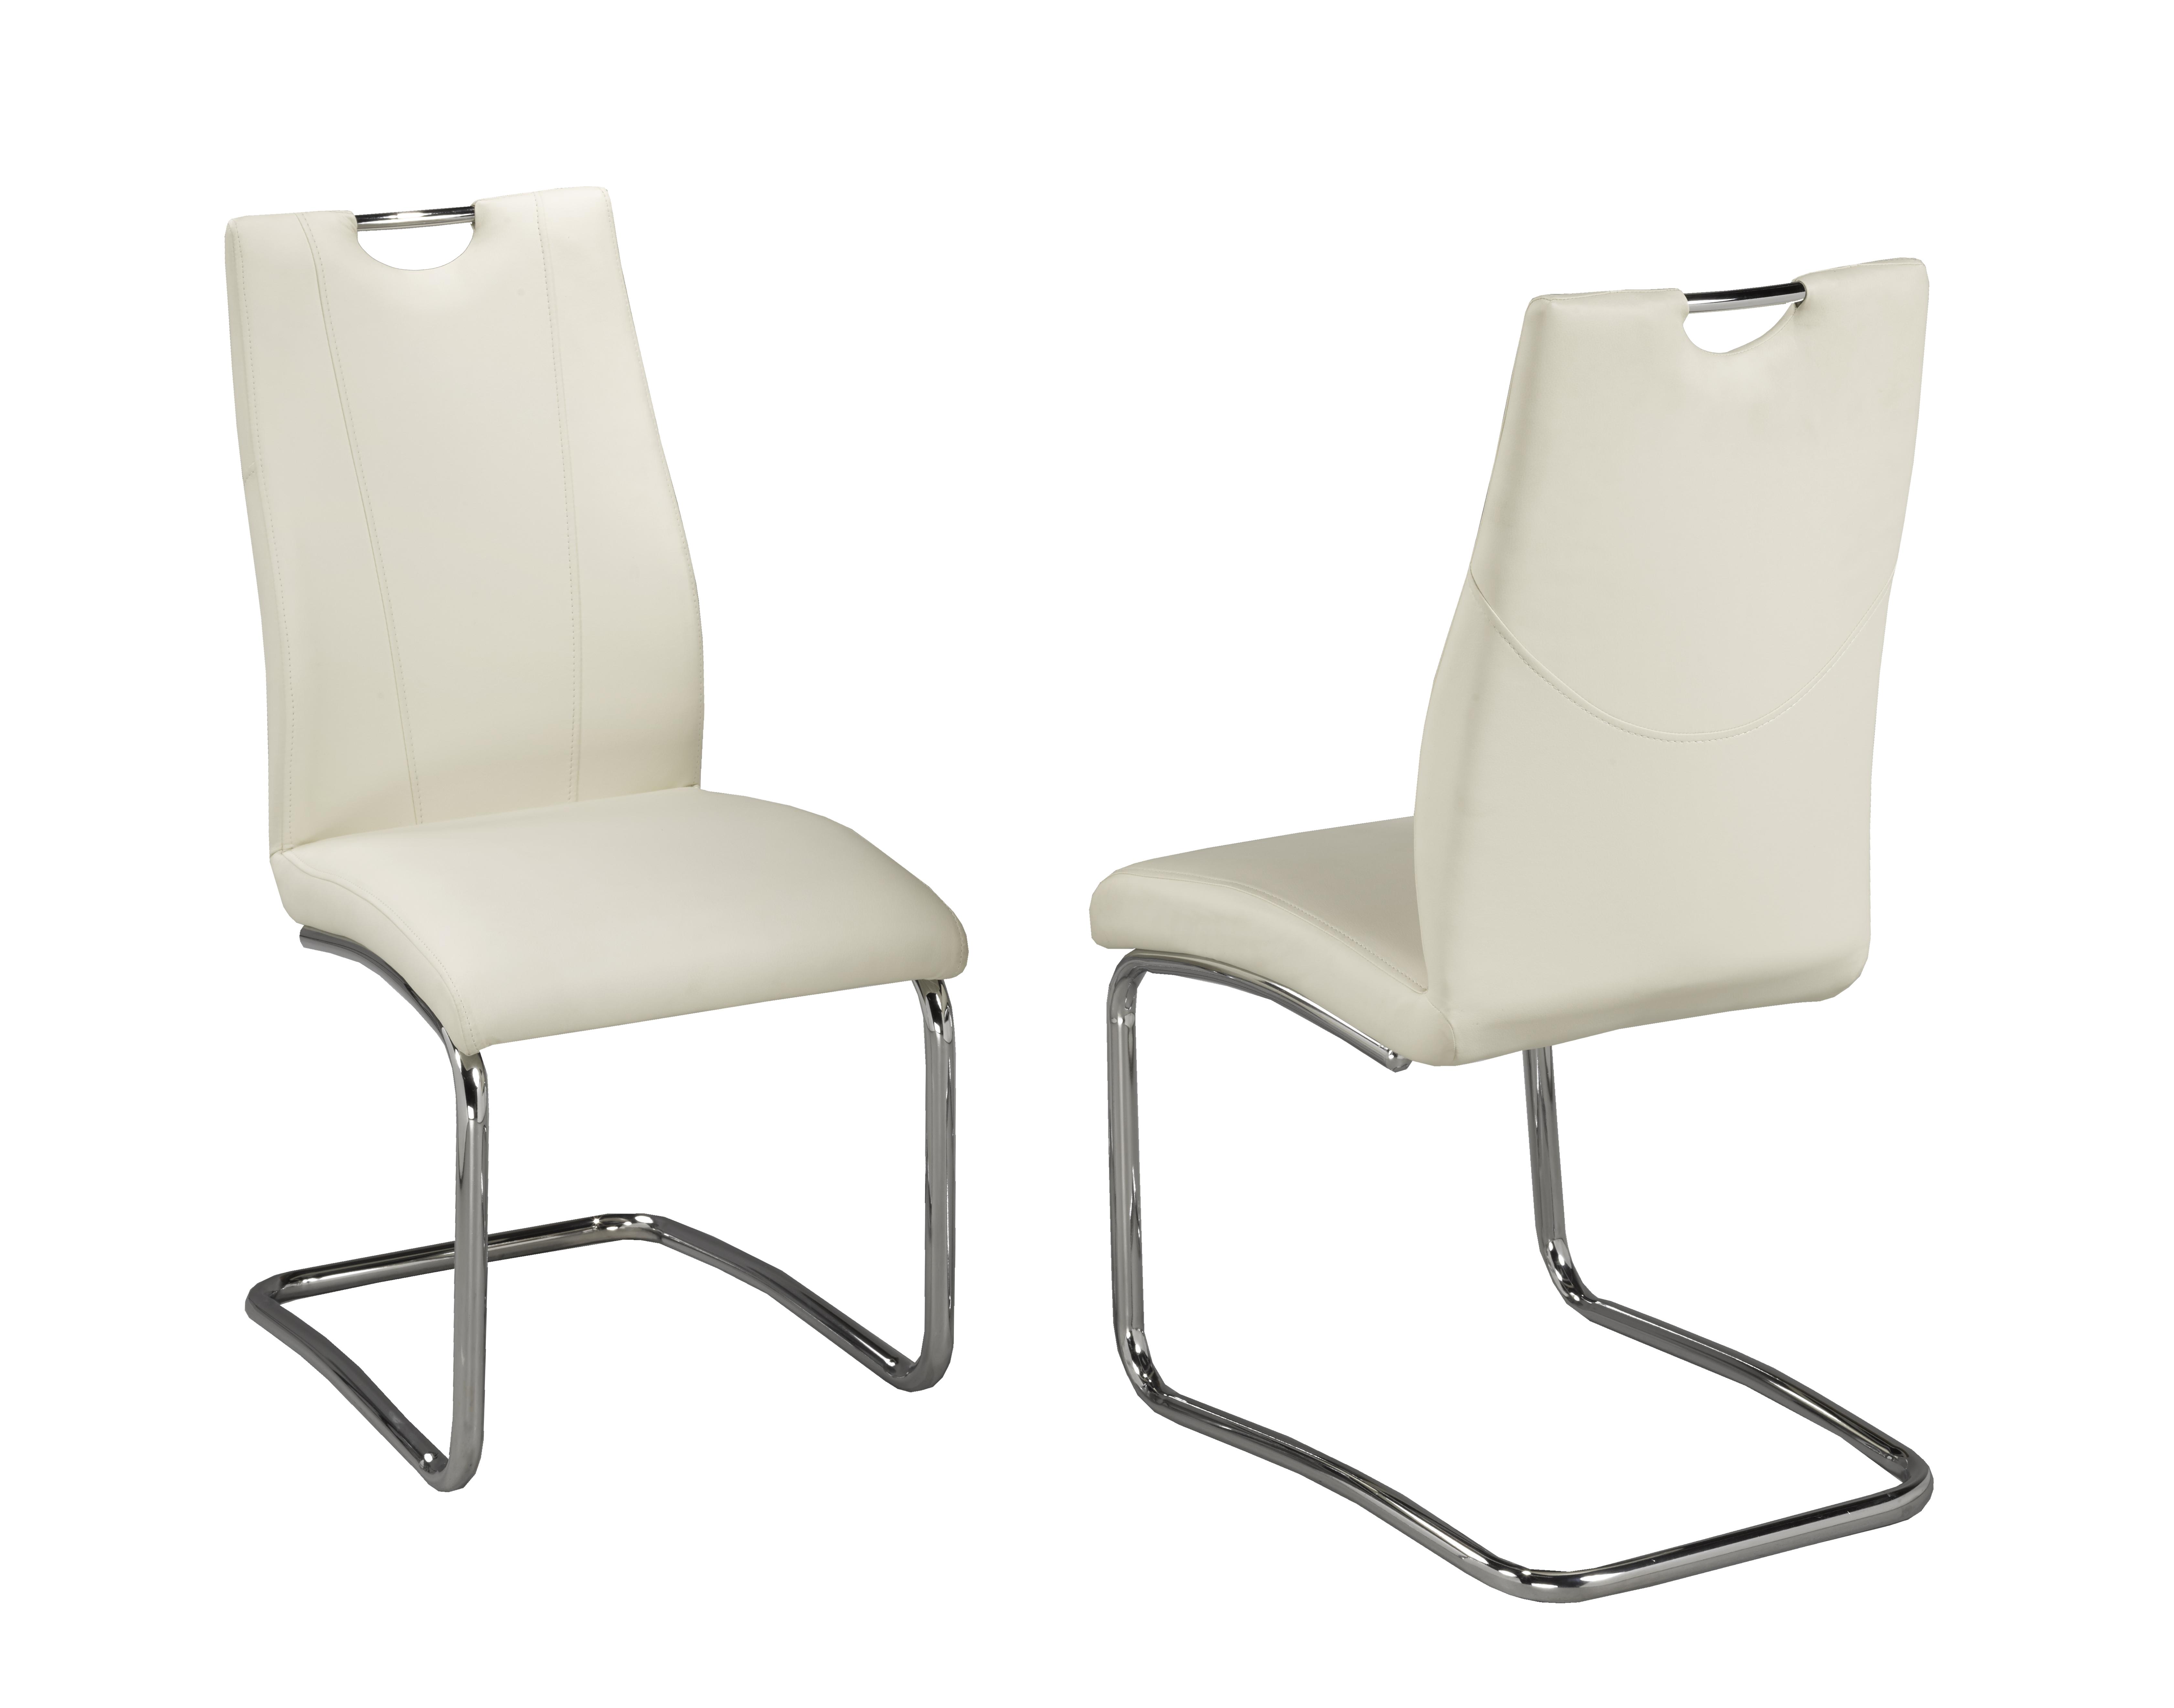 POPPY WHITE PU CHAIR W/CHROME LEGS (DINING CHAIR SET OF 2 )